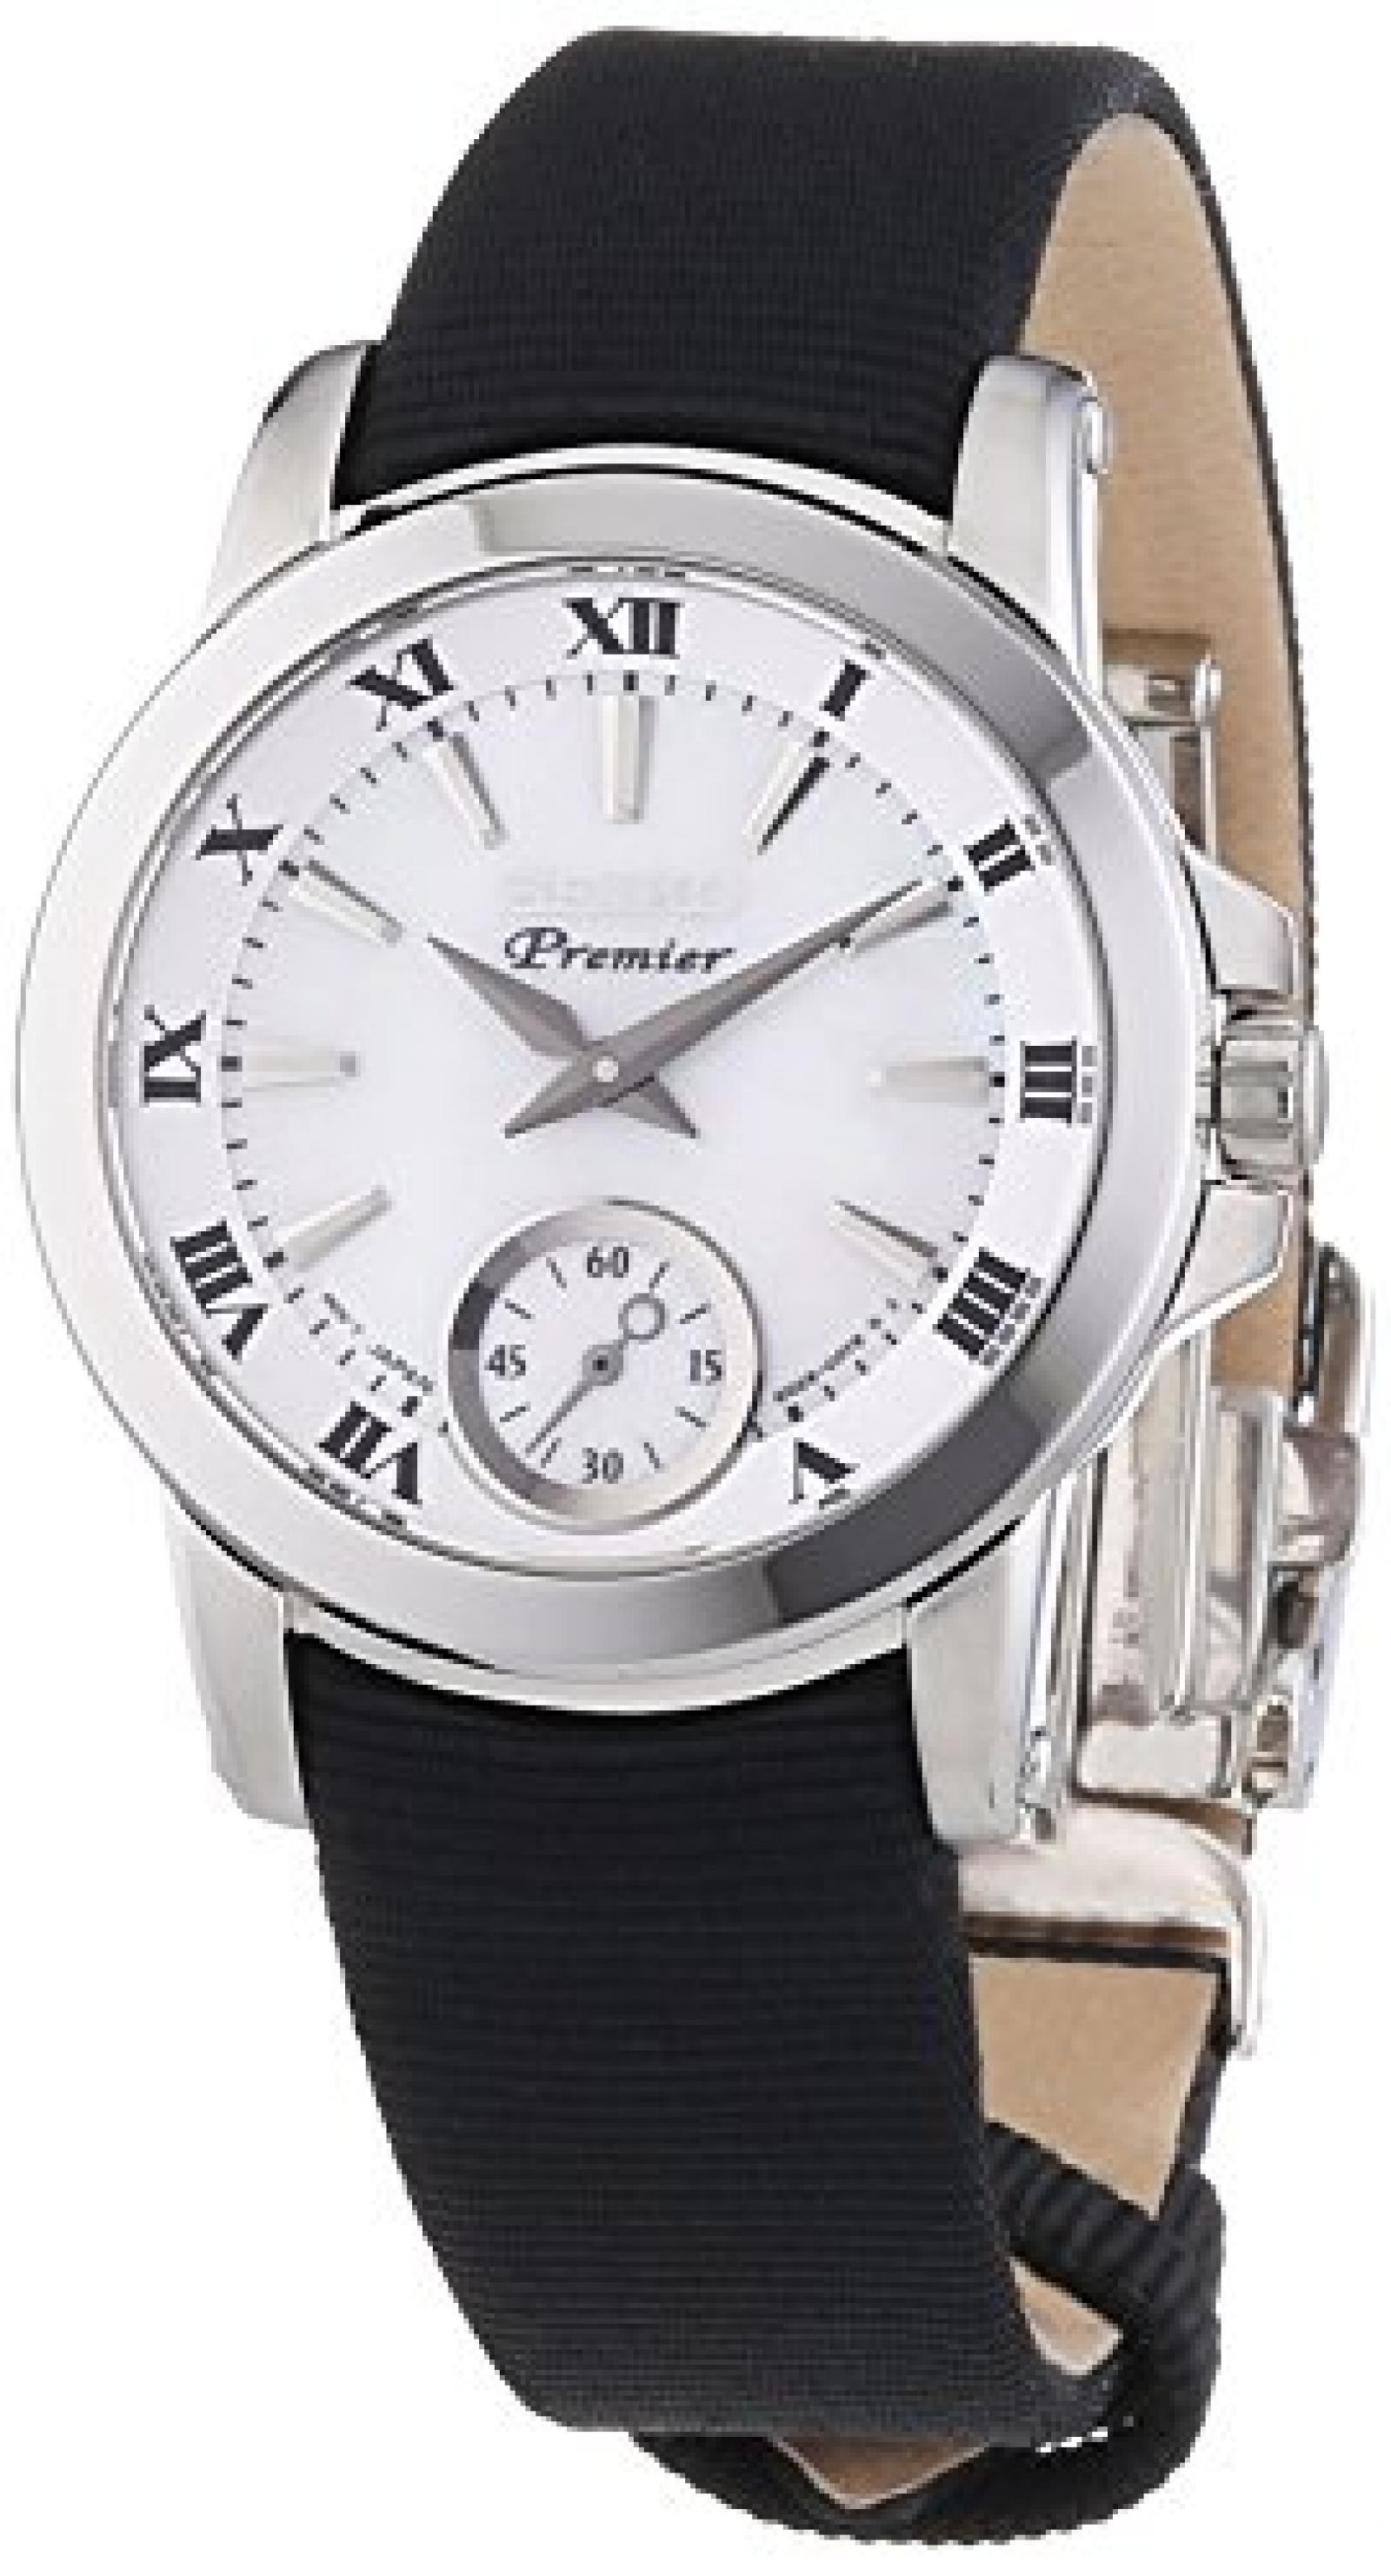 Seiko Damen-Armbanduhr XS Premier Analog Quarz Textil SRKZ63P1